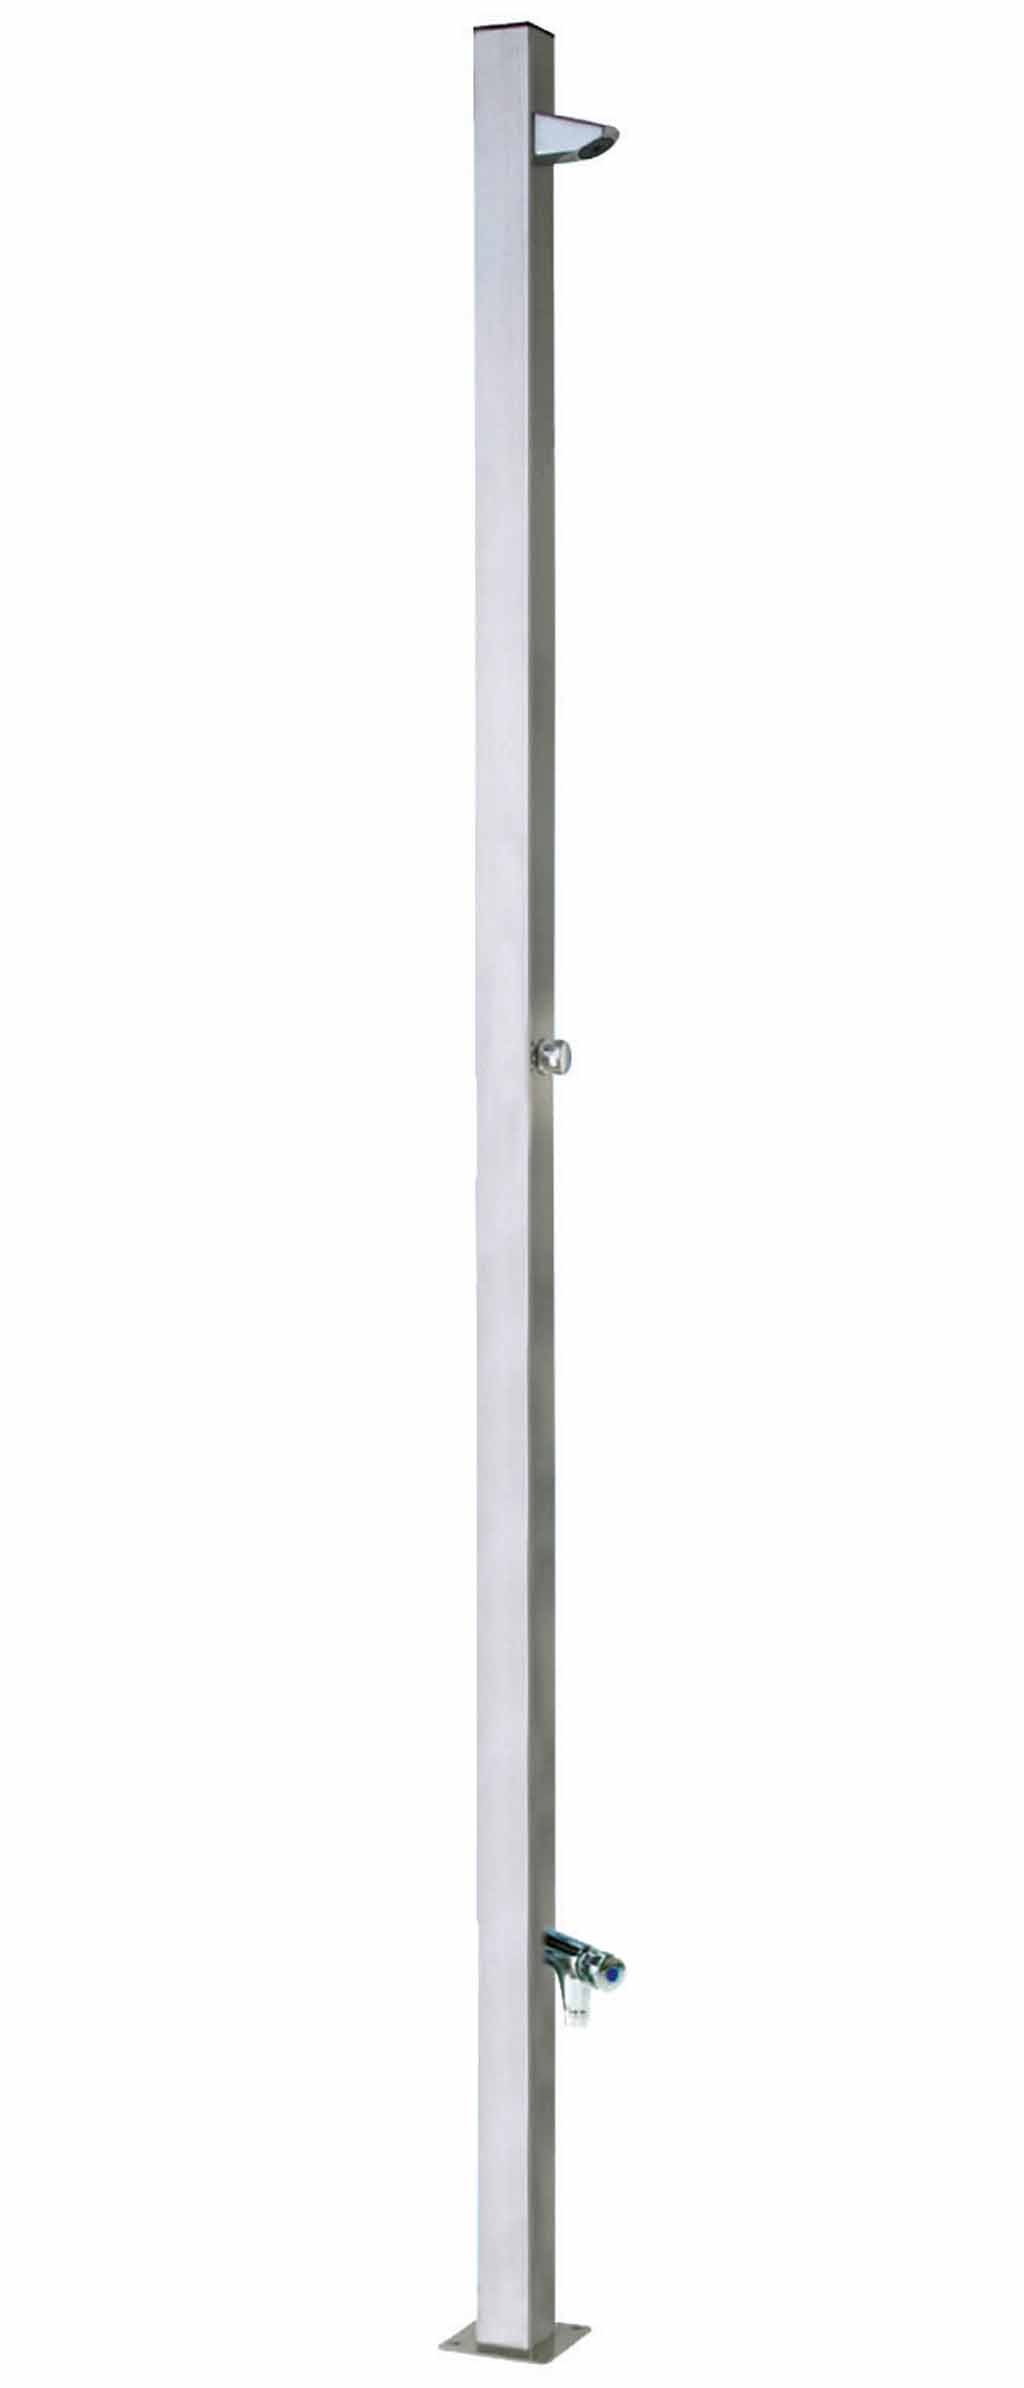 Bazénová sprcha Tetra automat s oplachom nôh